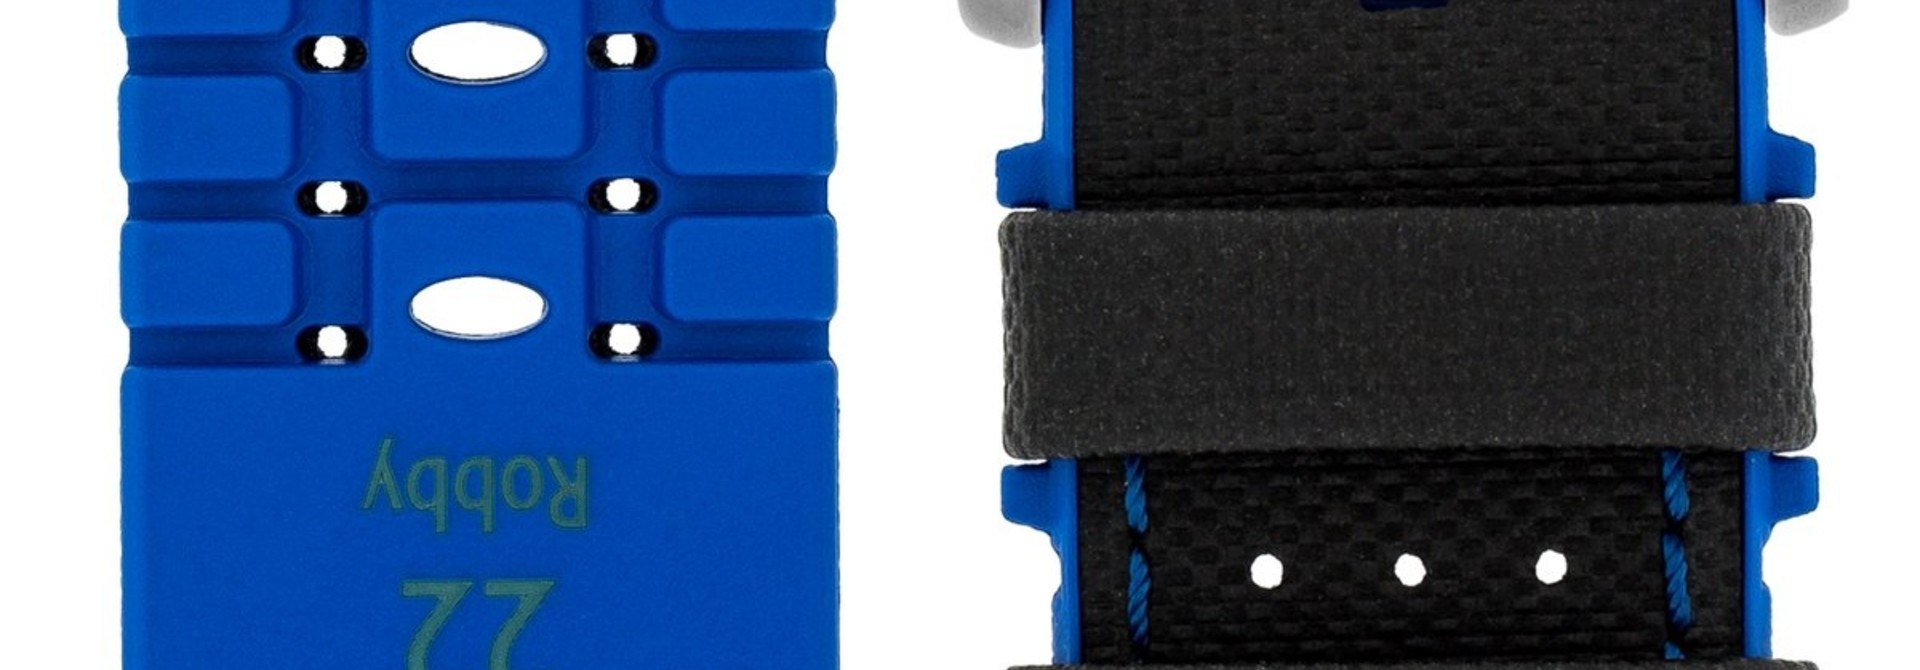 Horlogebandje Robby Kalfsleer + Premium Rubber 24 mm